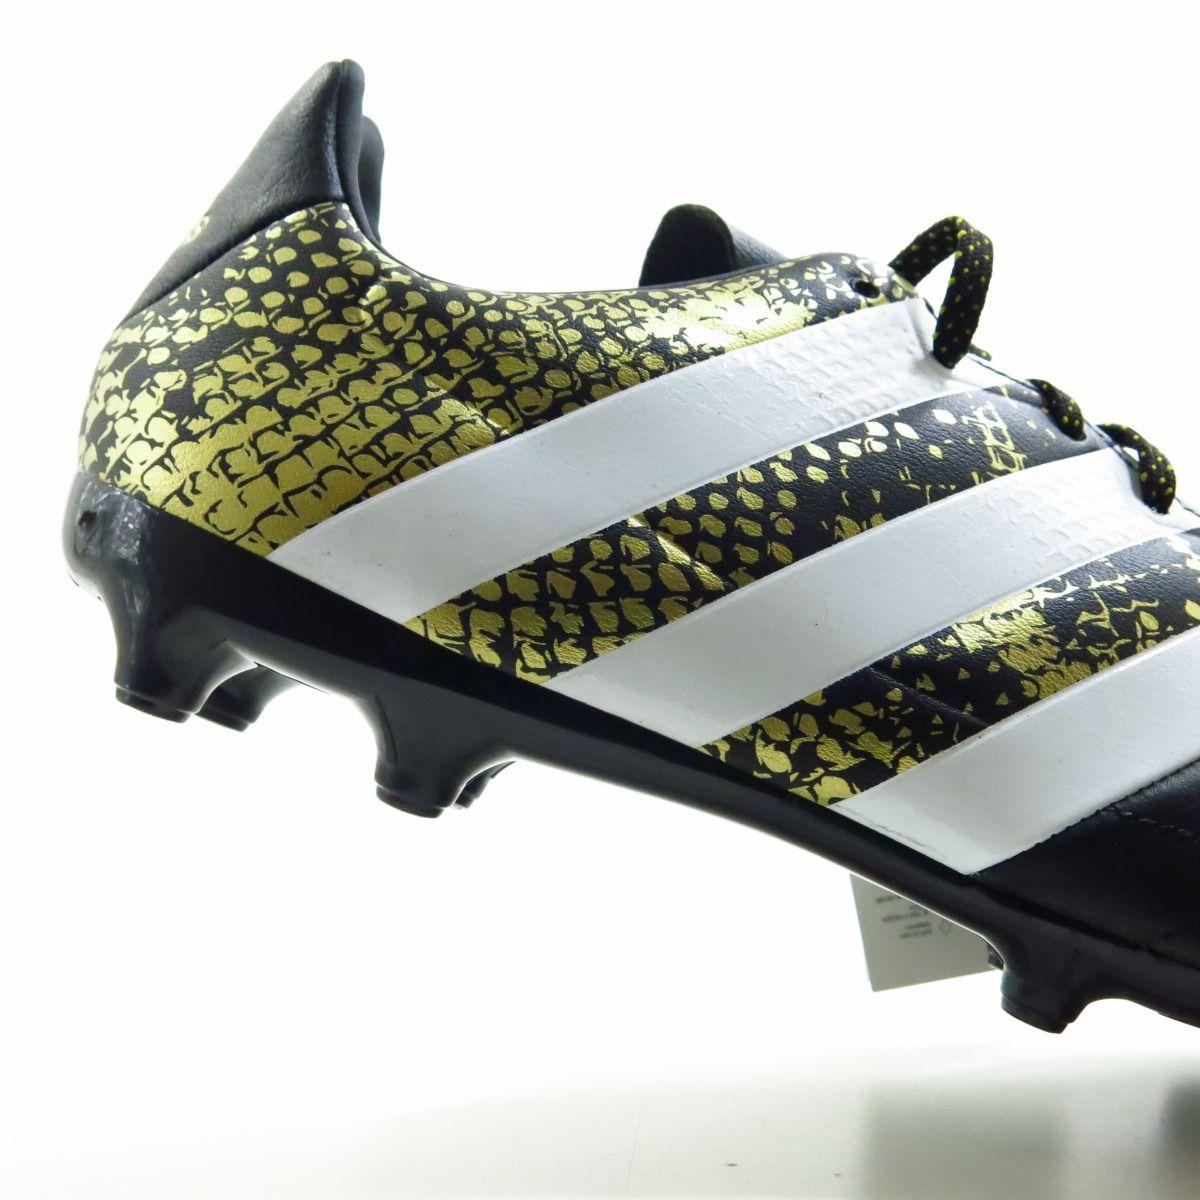 Chuteira Adidas Ace 16.3 FG - Couro